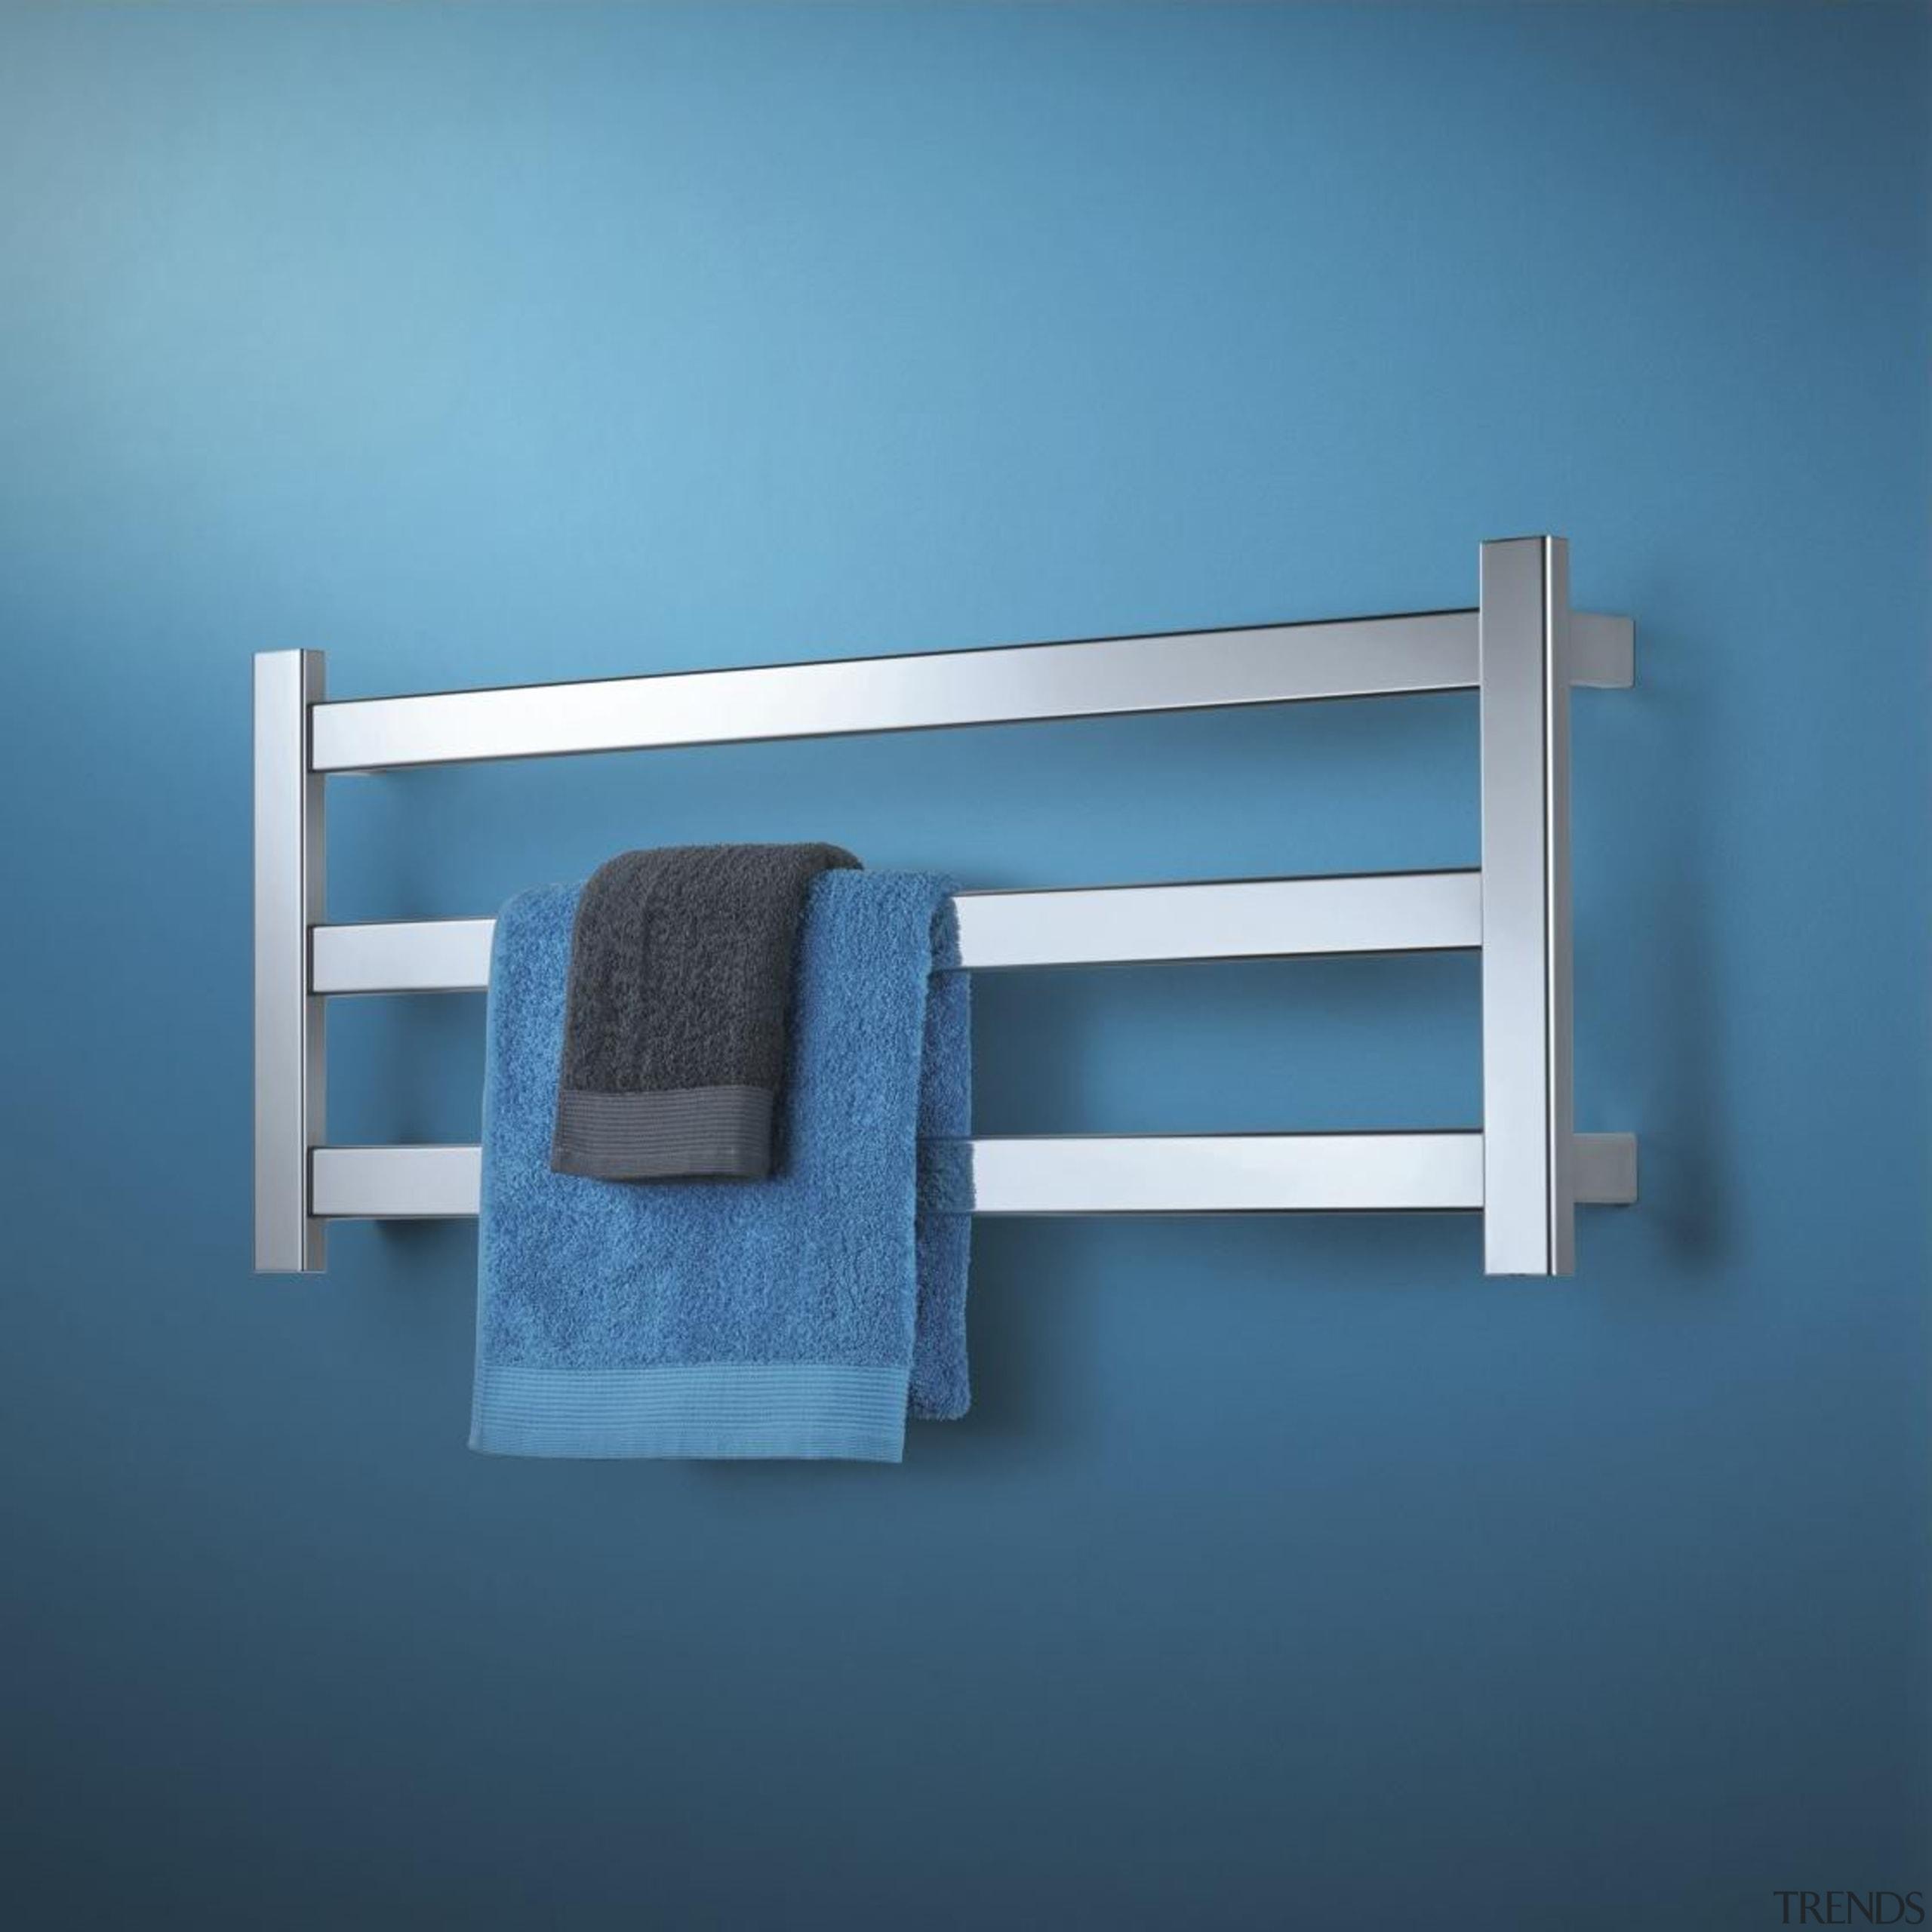 HYBRID 420 Heated Ladder - HYBRID 420 Heated blue, furniture, product, shelf, shelving, teal